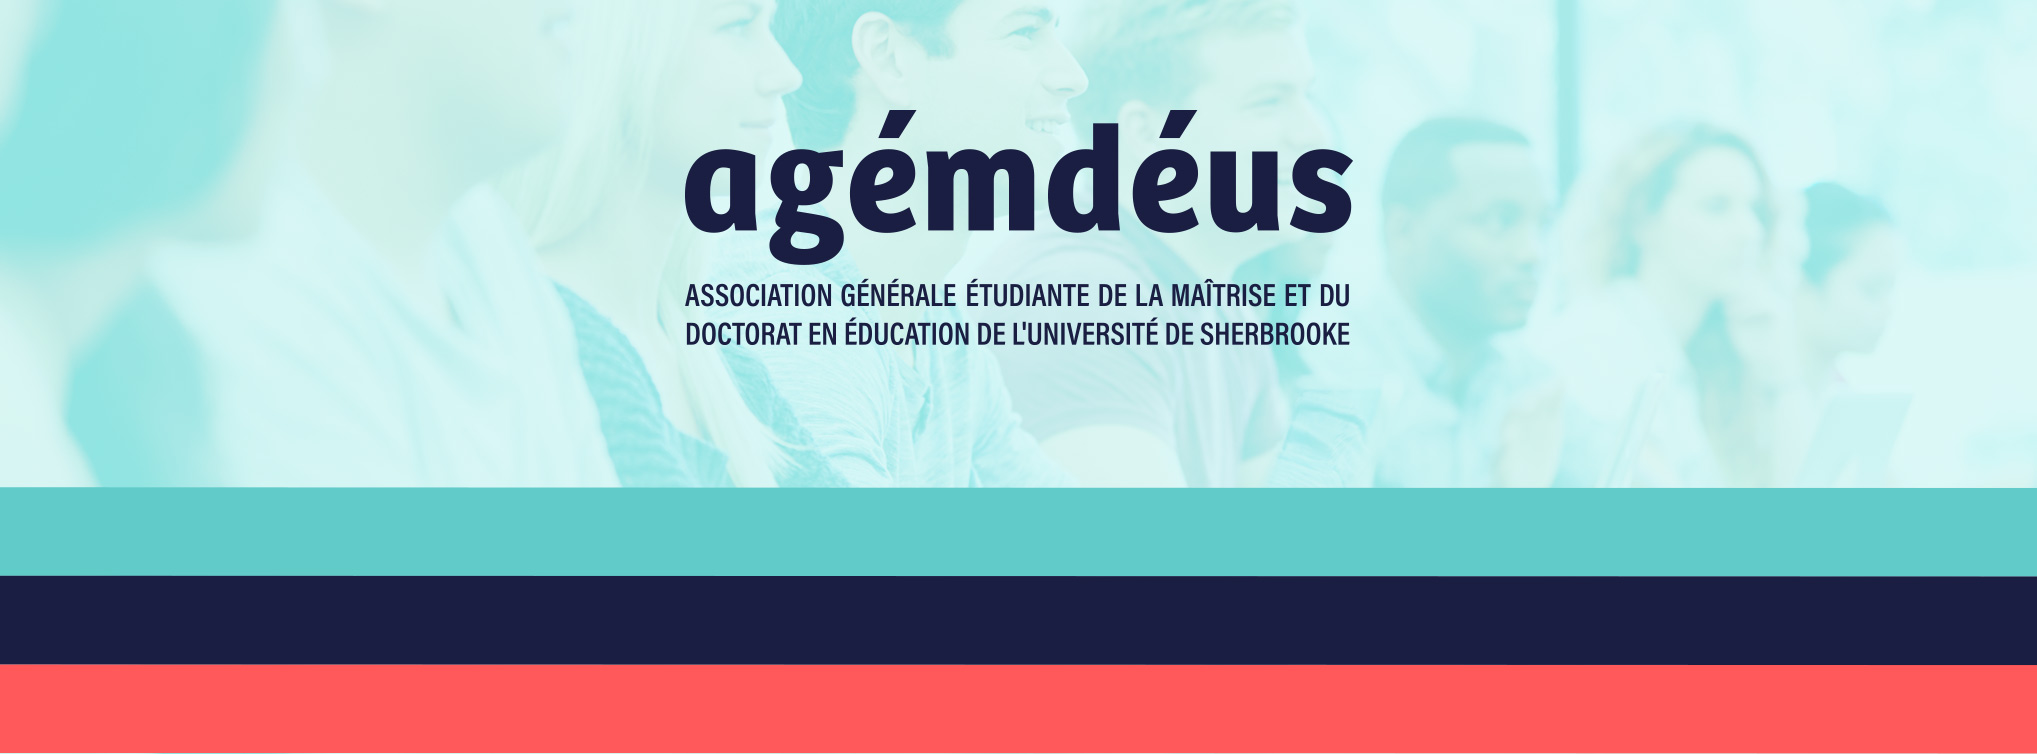 agemdeus_cover-1